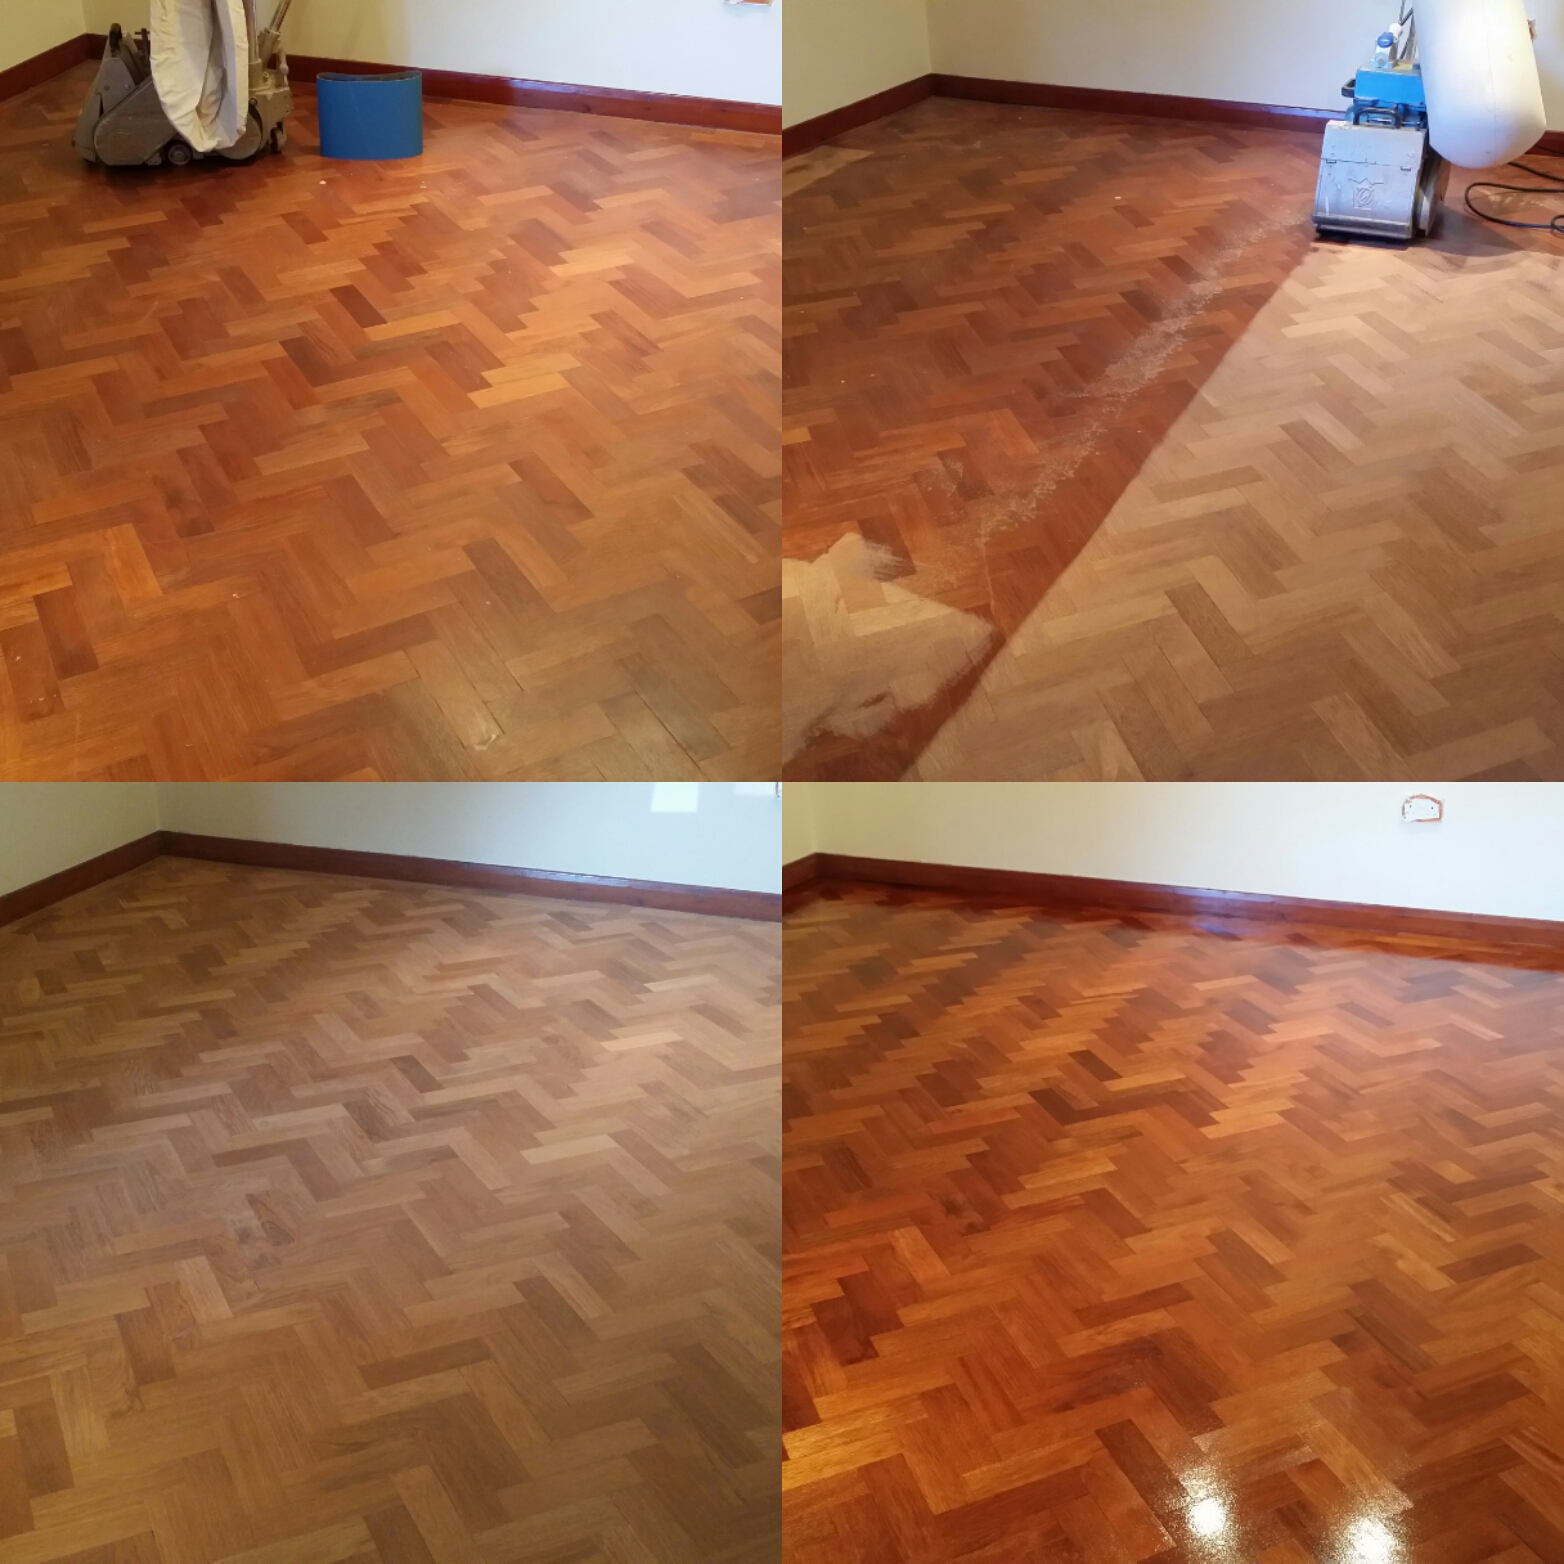 Parquet floor sanding in Chelmsford